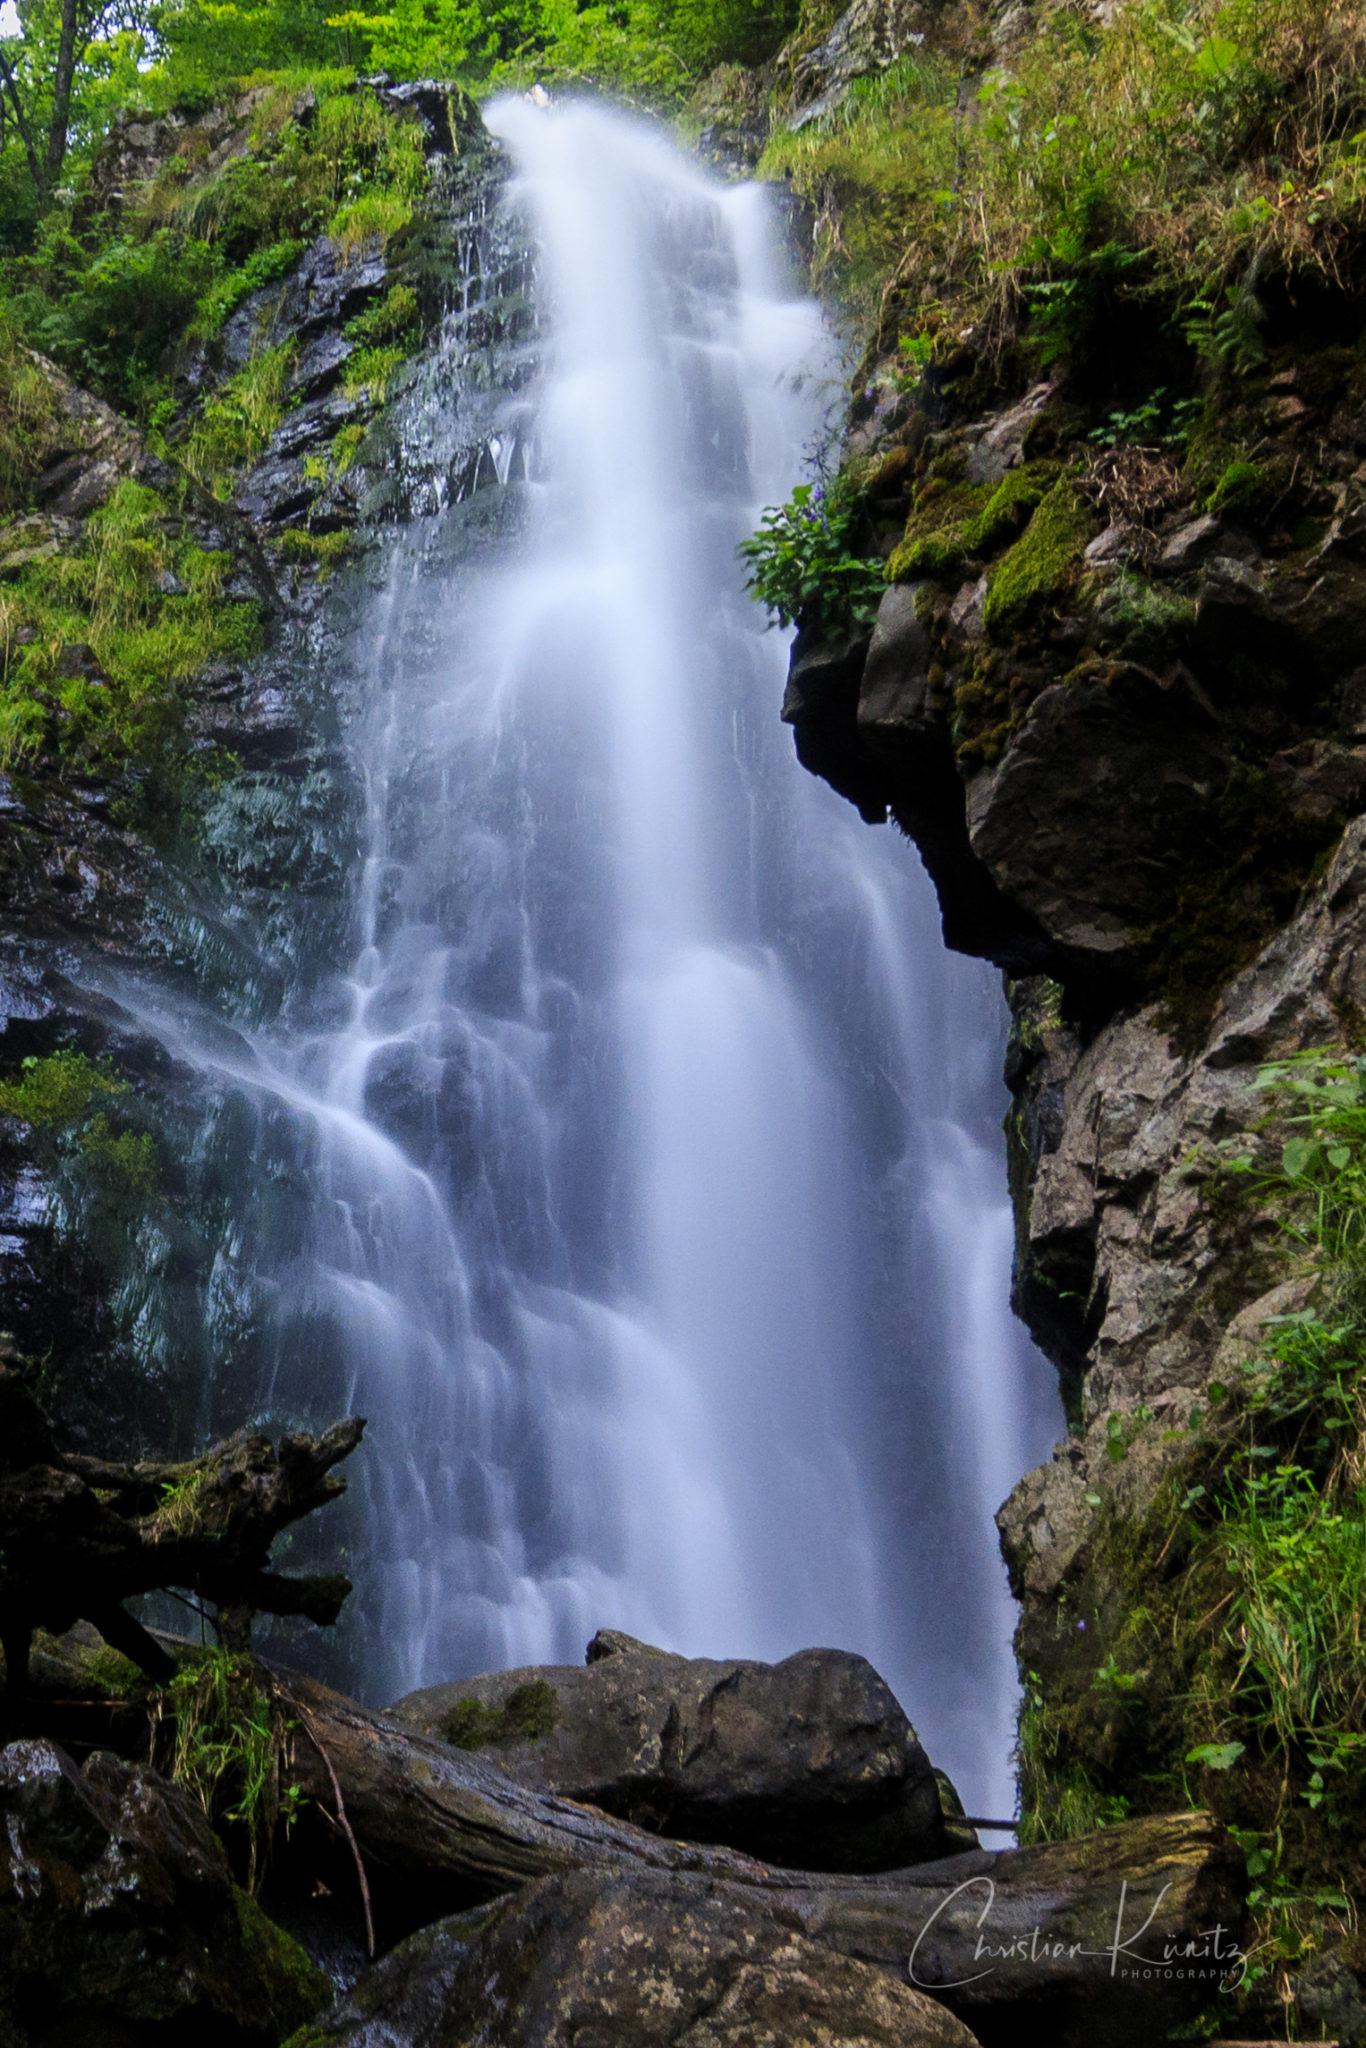 Todtnauer Wasserfall VI